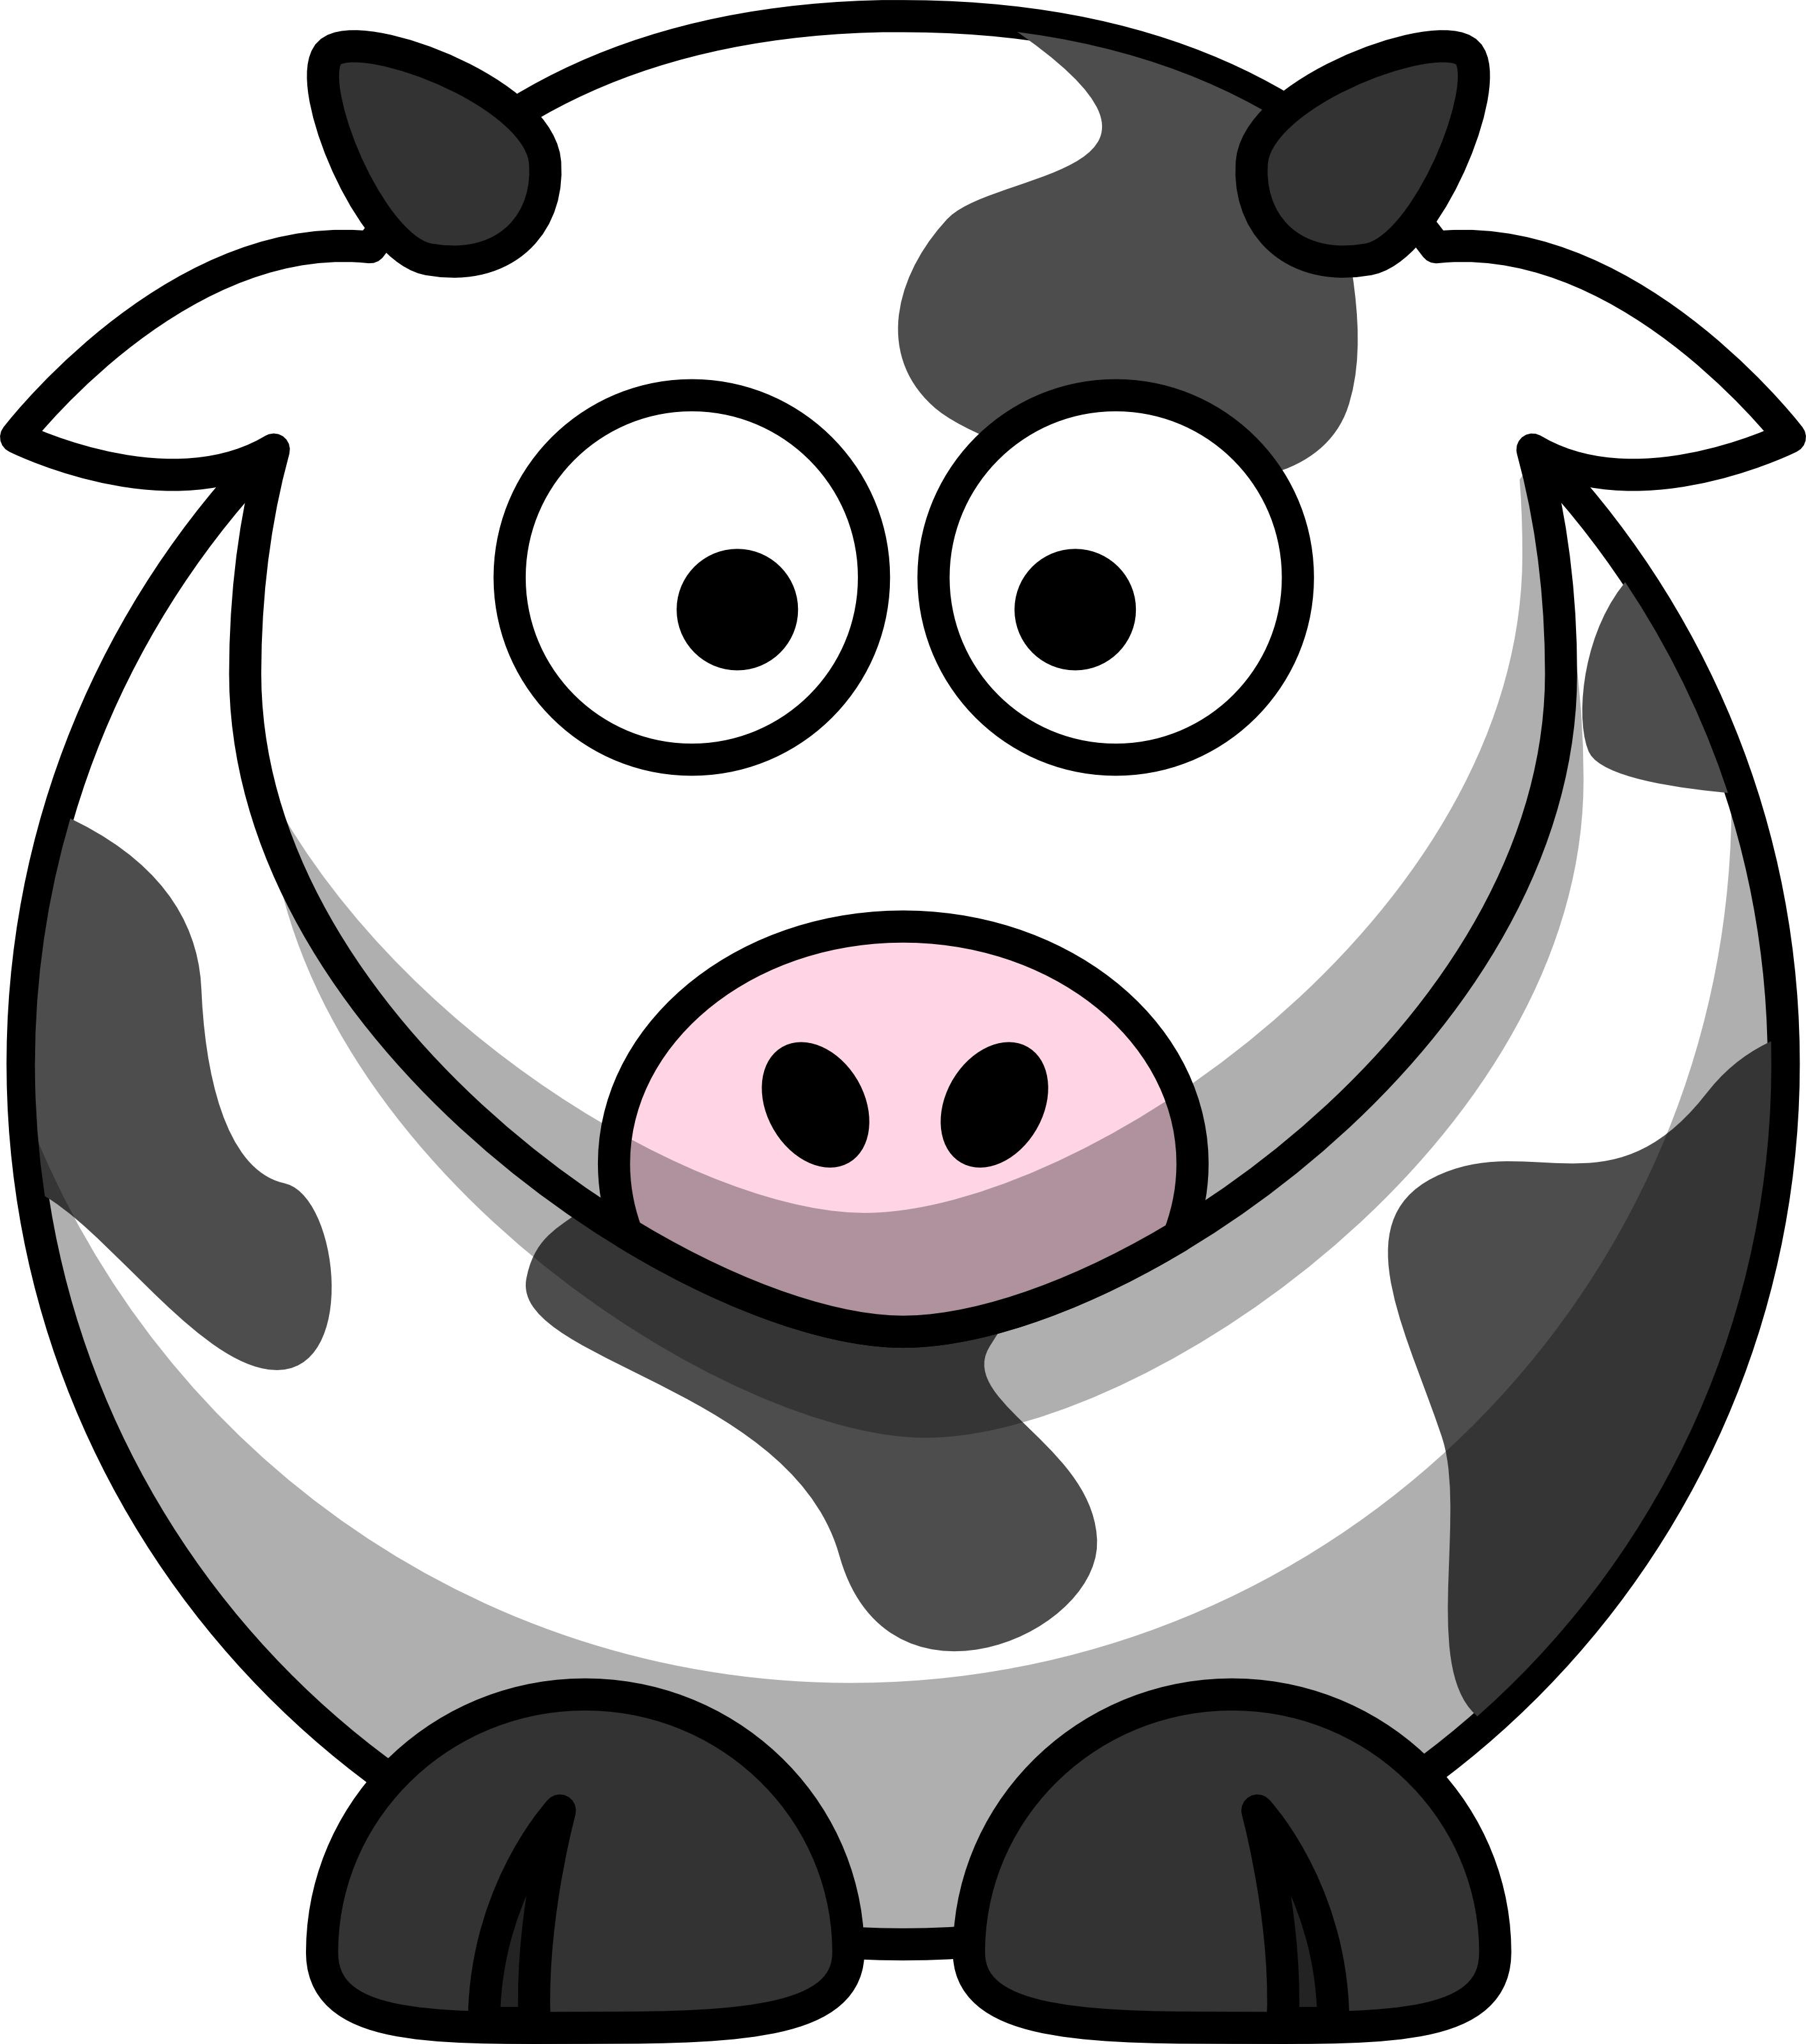 Free Cartoon Cow Clip Art image - vector clip art online, royalty